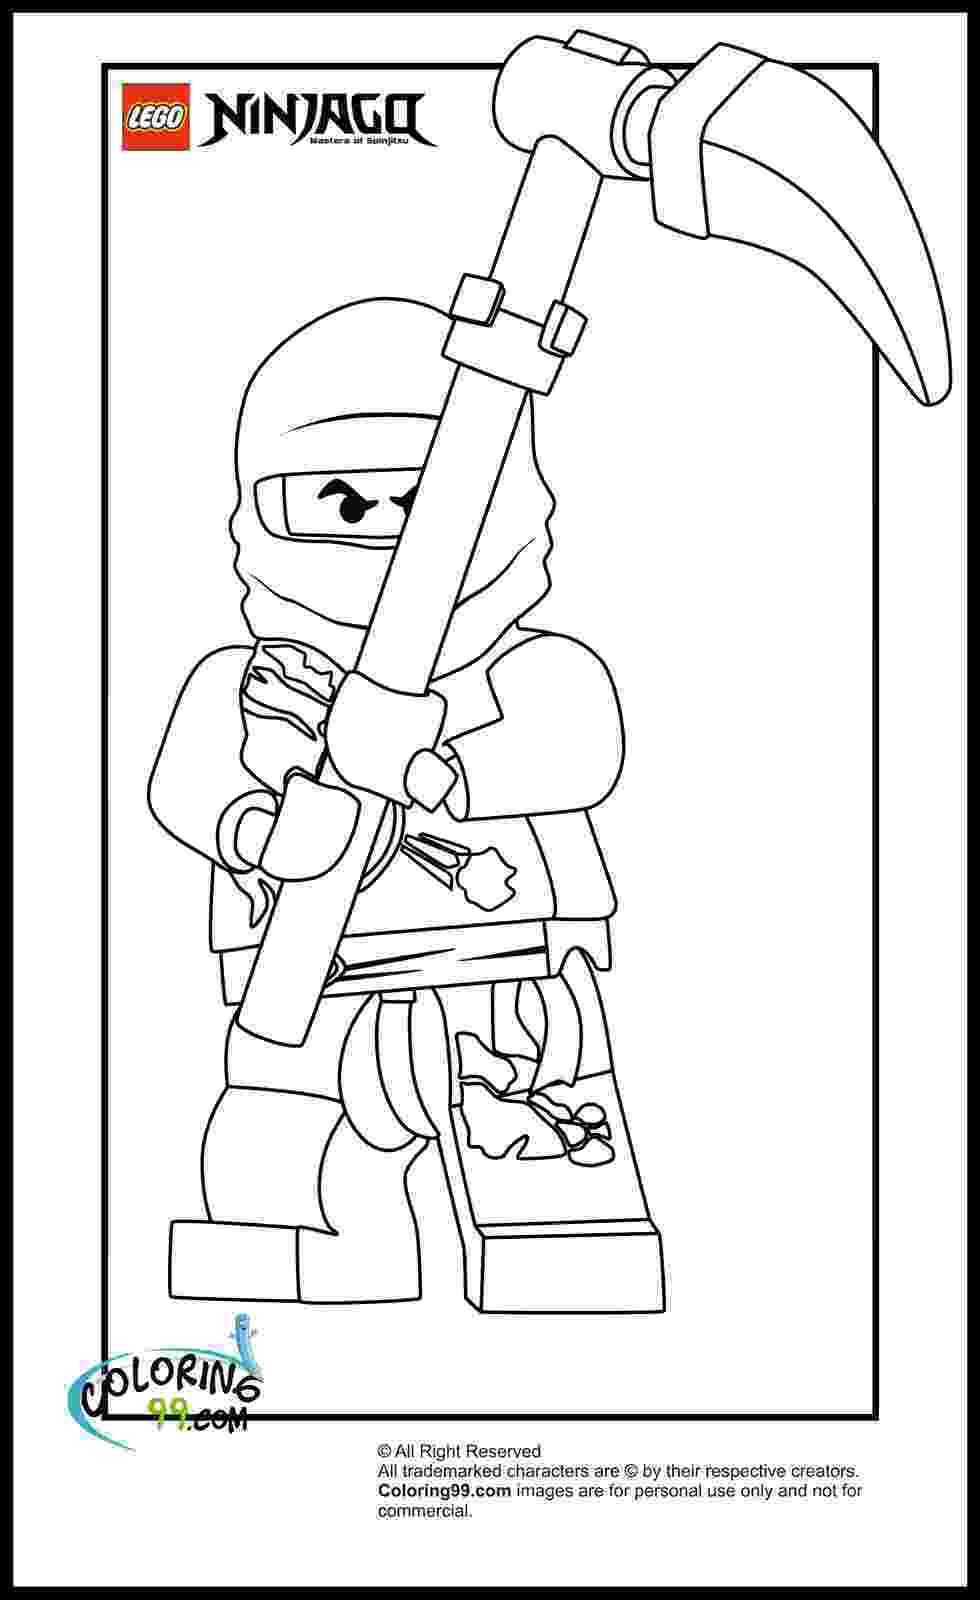 ninjago coloring lego ninjago cole coloring pages minister coloring ninjago coloring